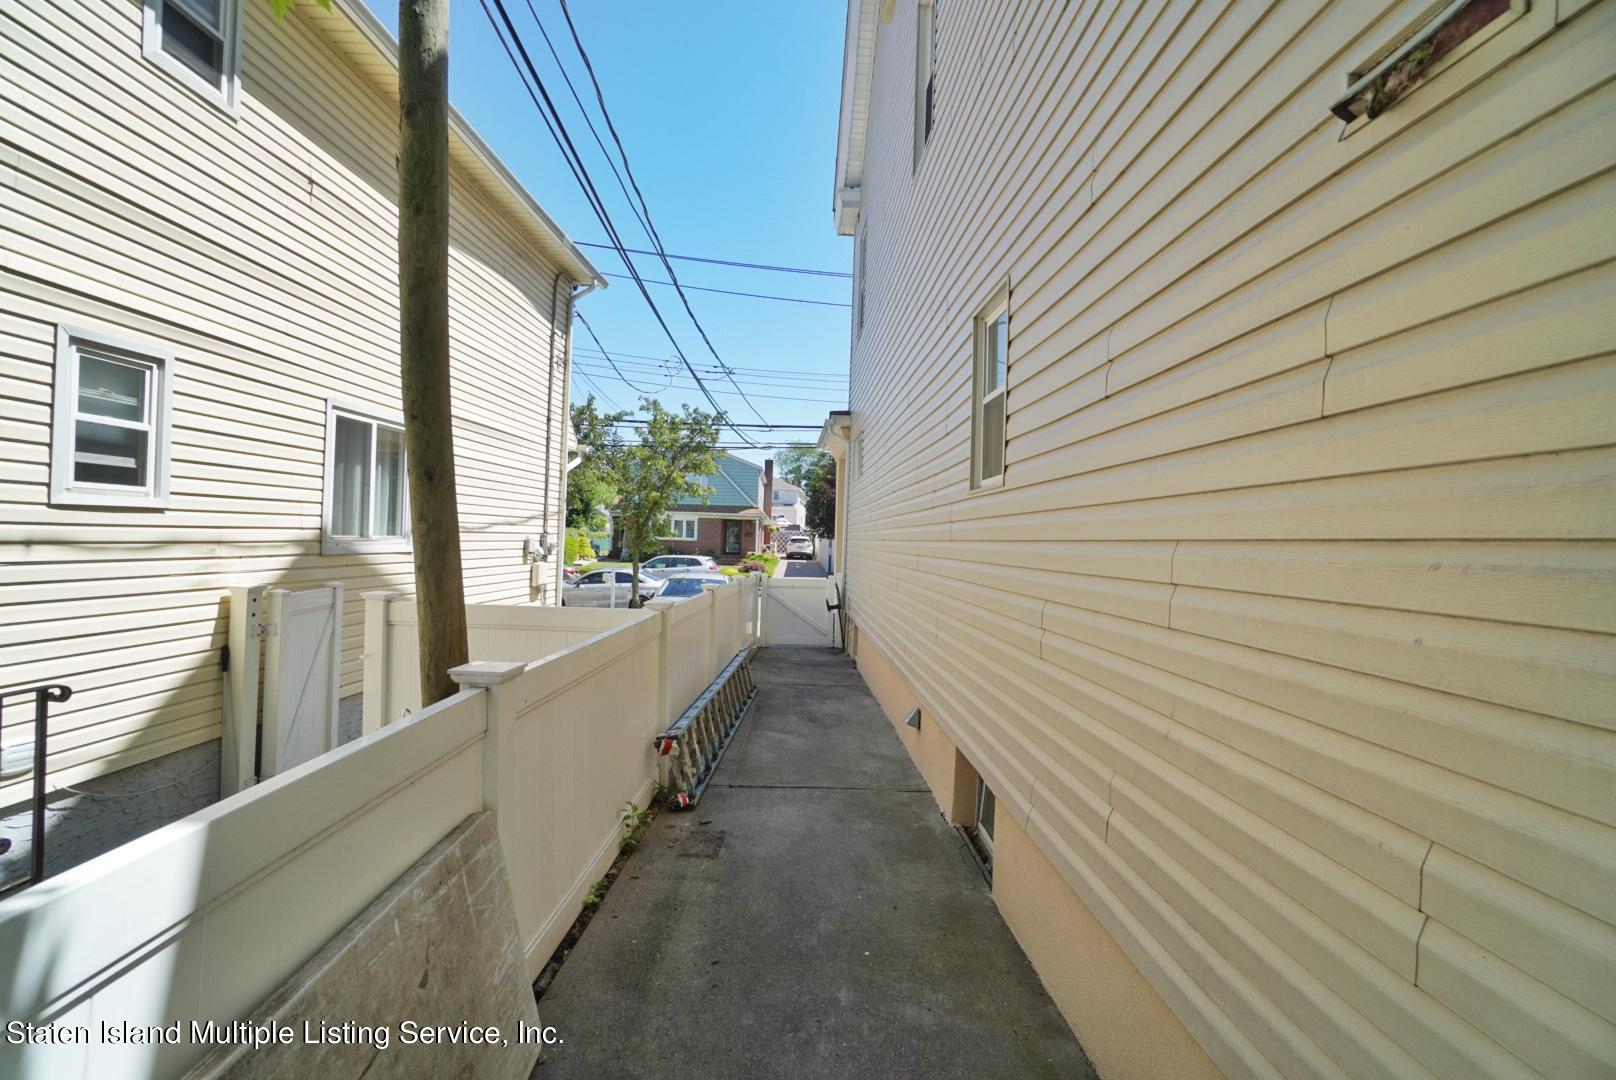 Single Family - Detached 264 Fisher Avenue  Staten Island, NY 10307, MLS-1146898-46